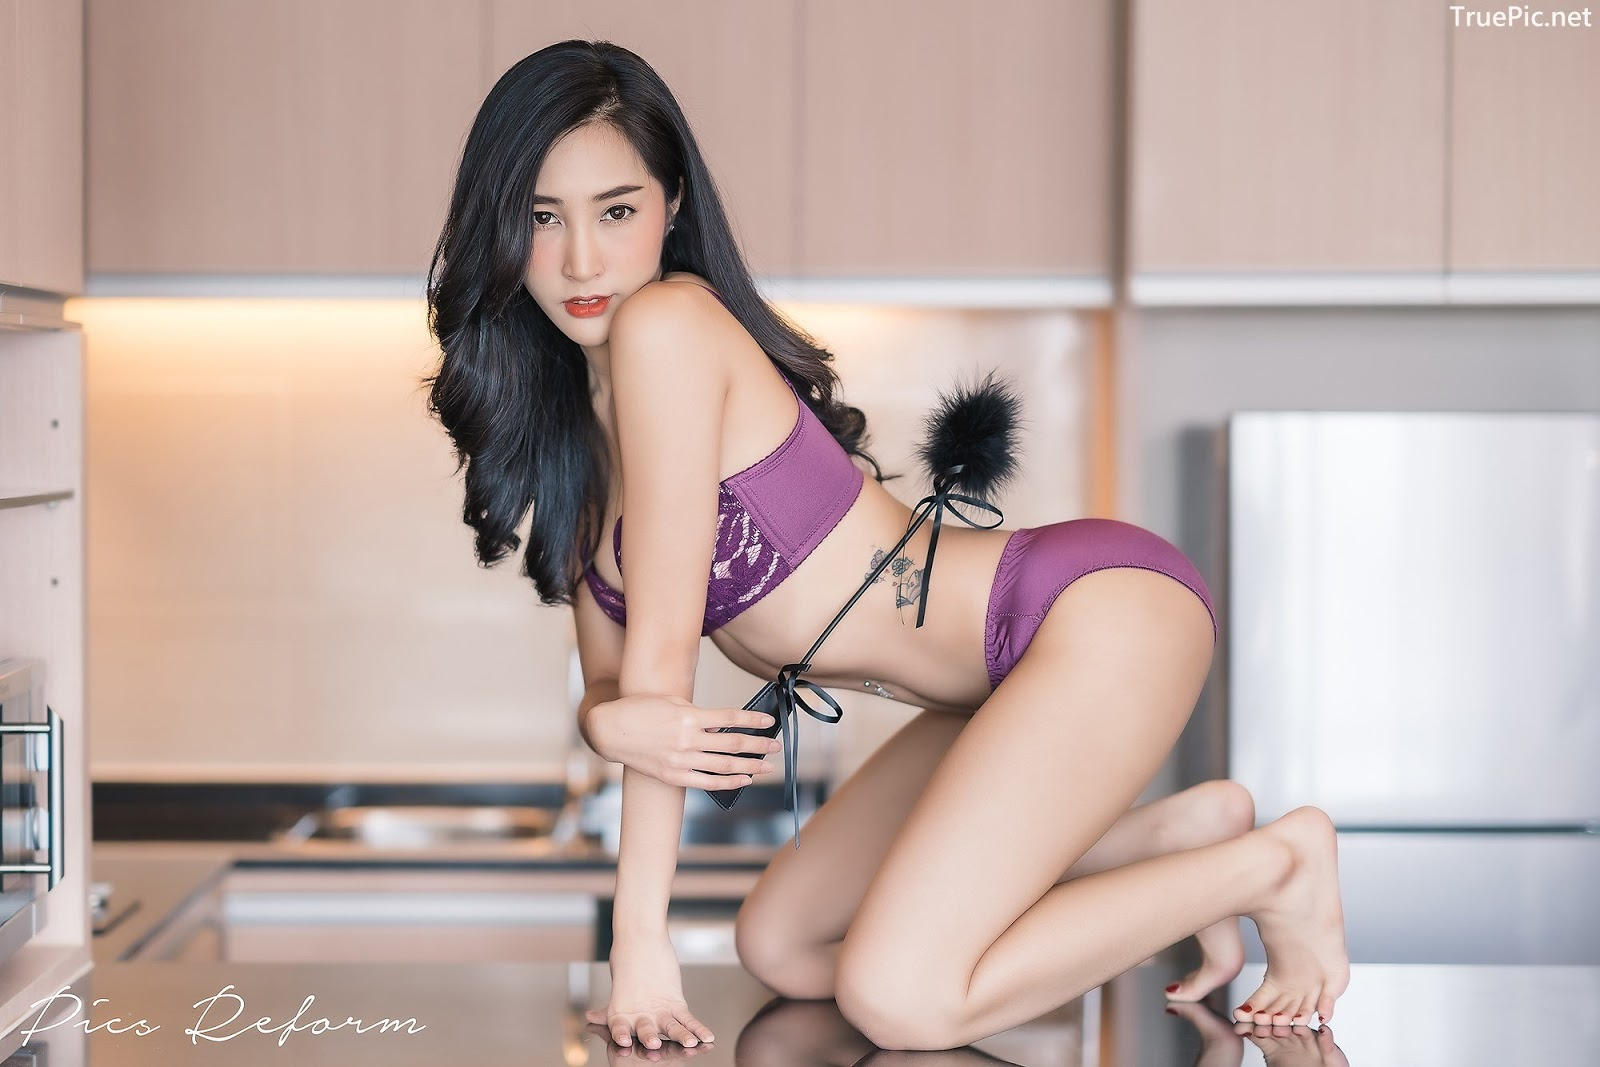 Image-Thailand-Sexy-Model-Yanapat-Ukkararujipat-Violet-Girl-TruePic.net- Picture-6